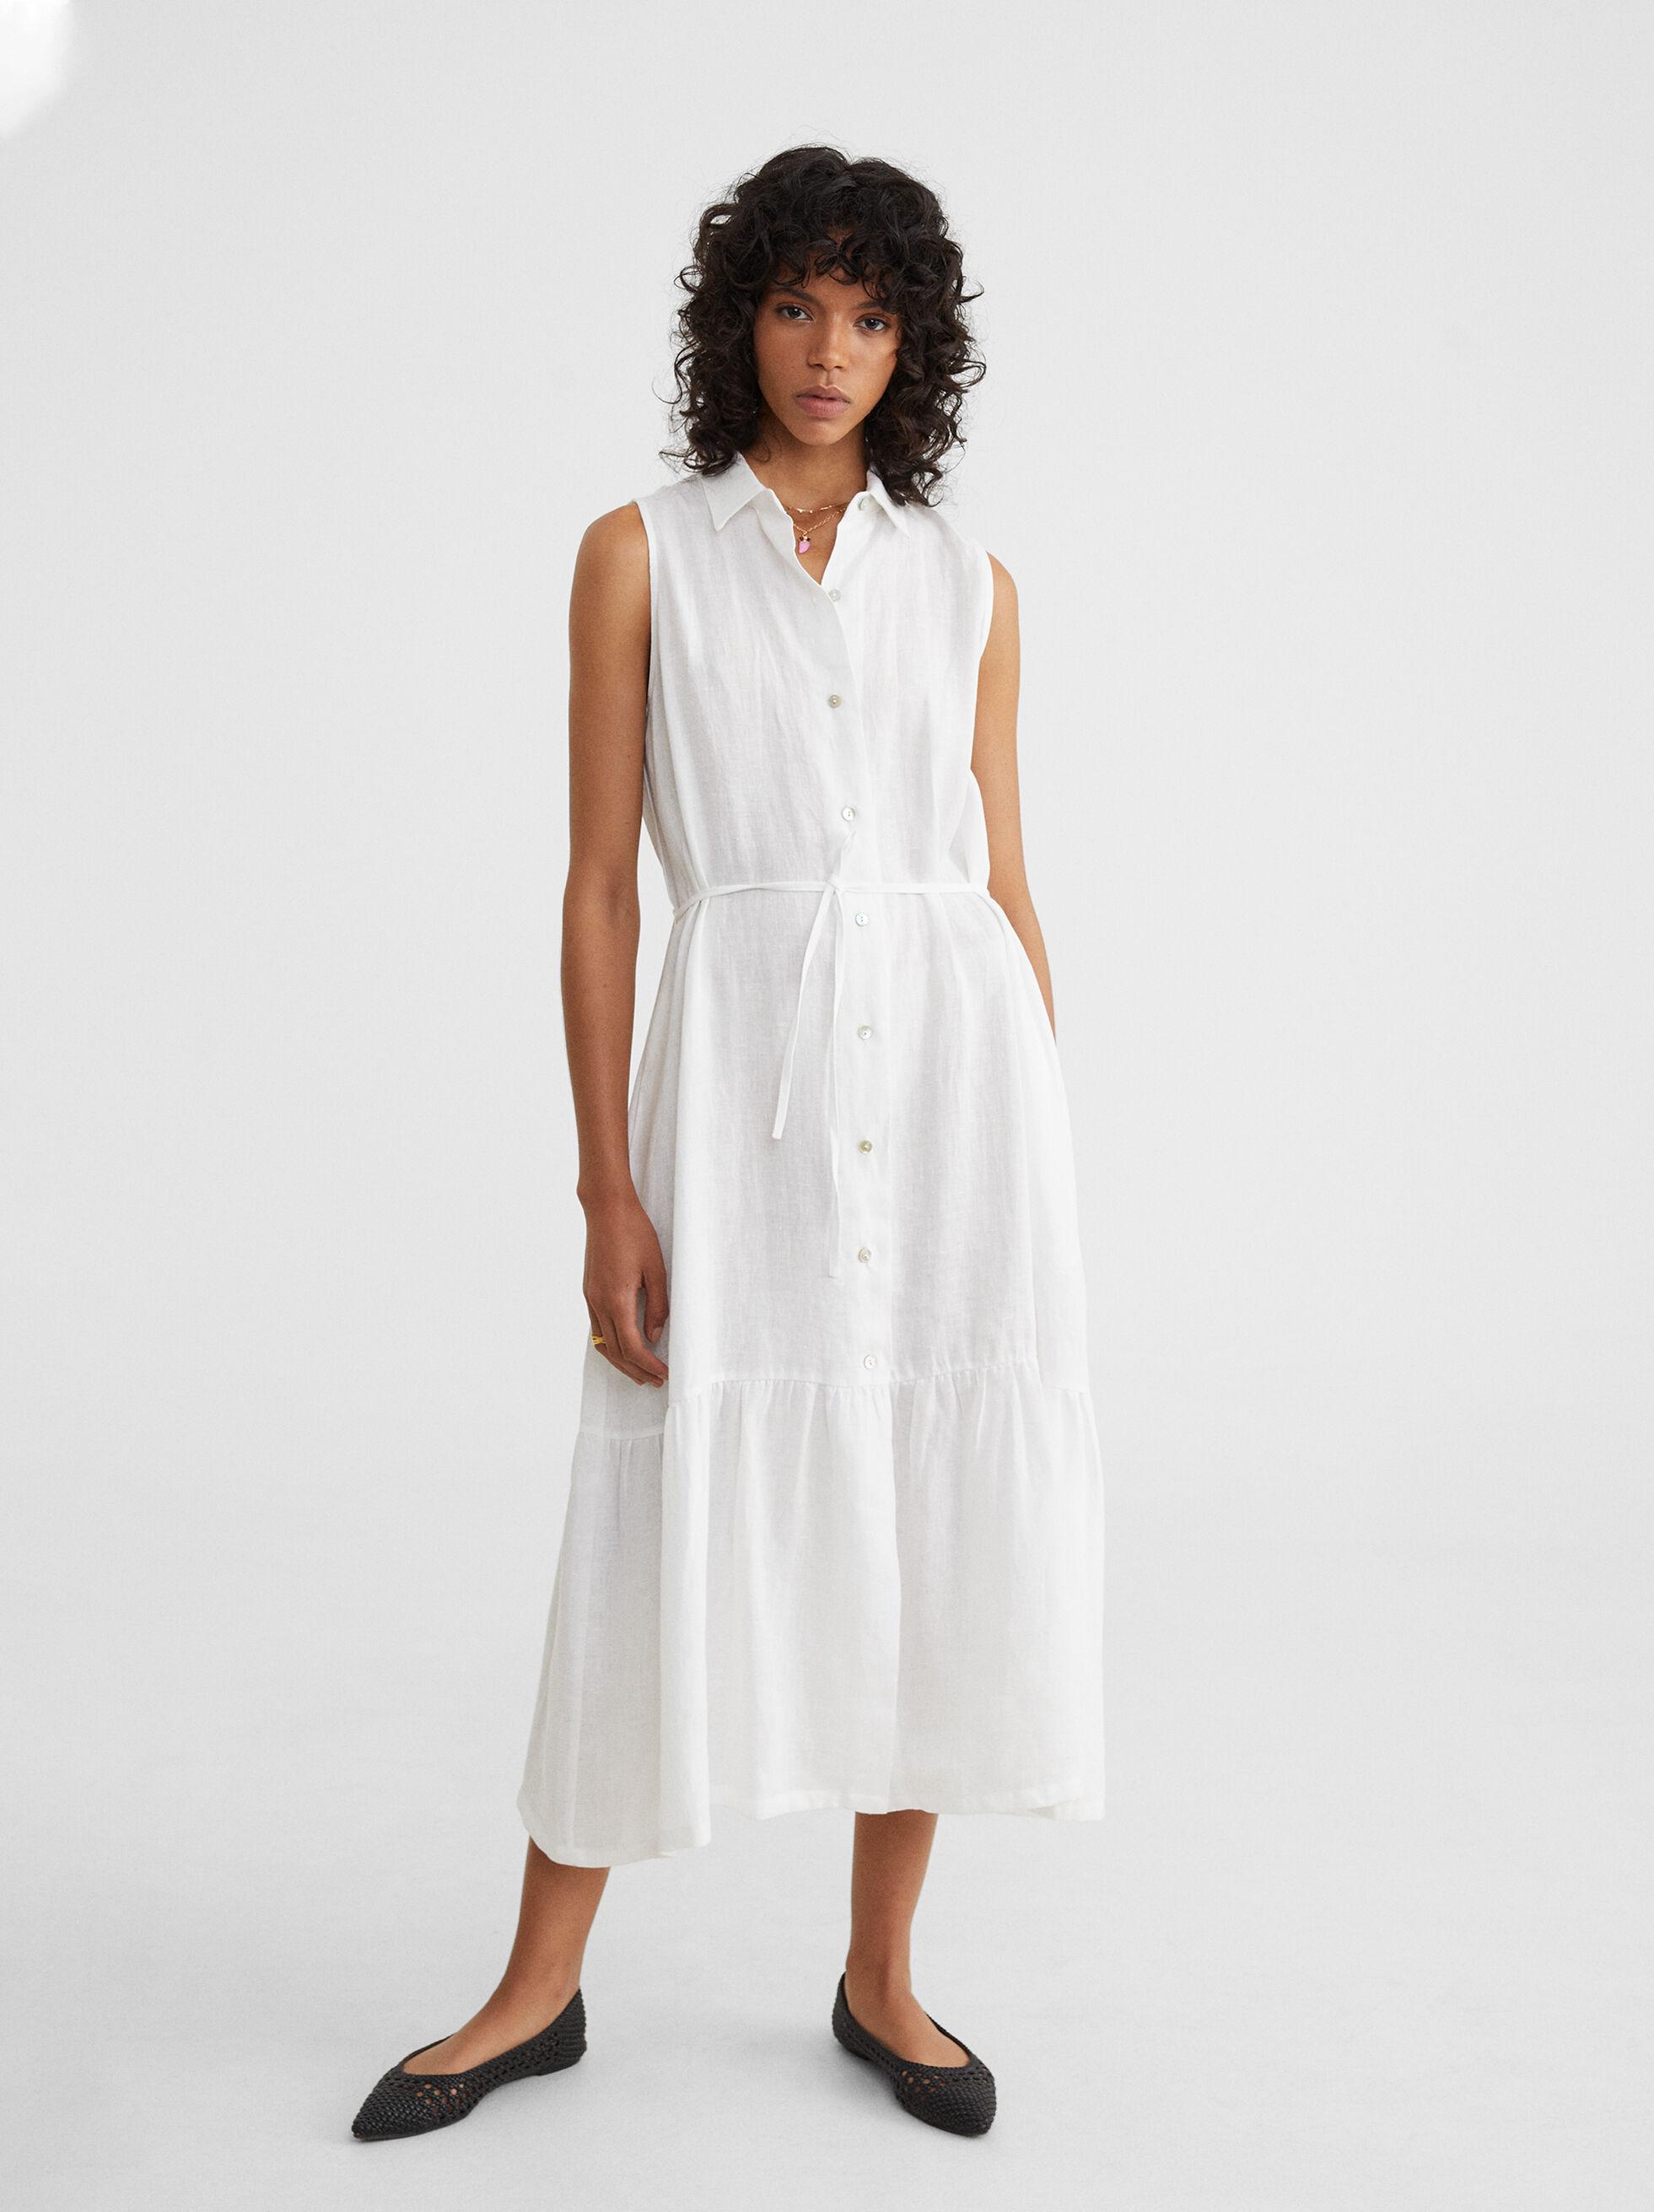 Linen Shirt Dress - White - Woman - Dresses - parfois.com